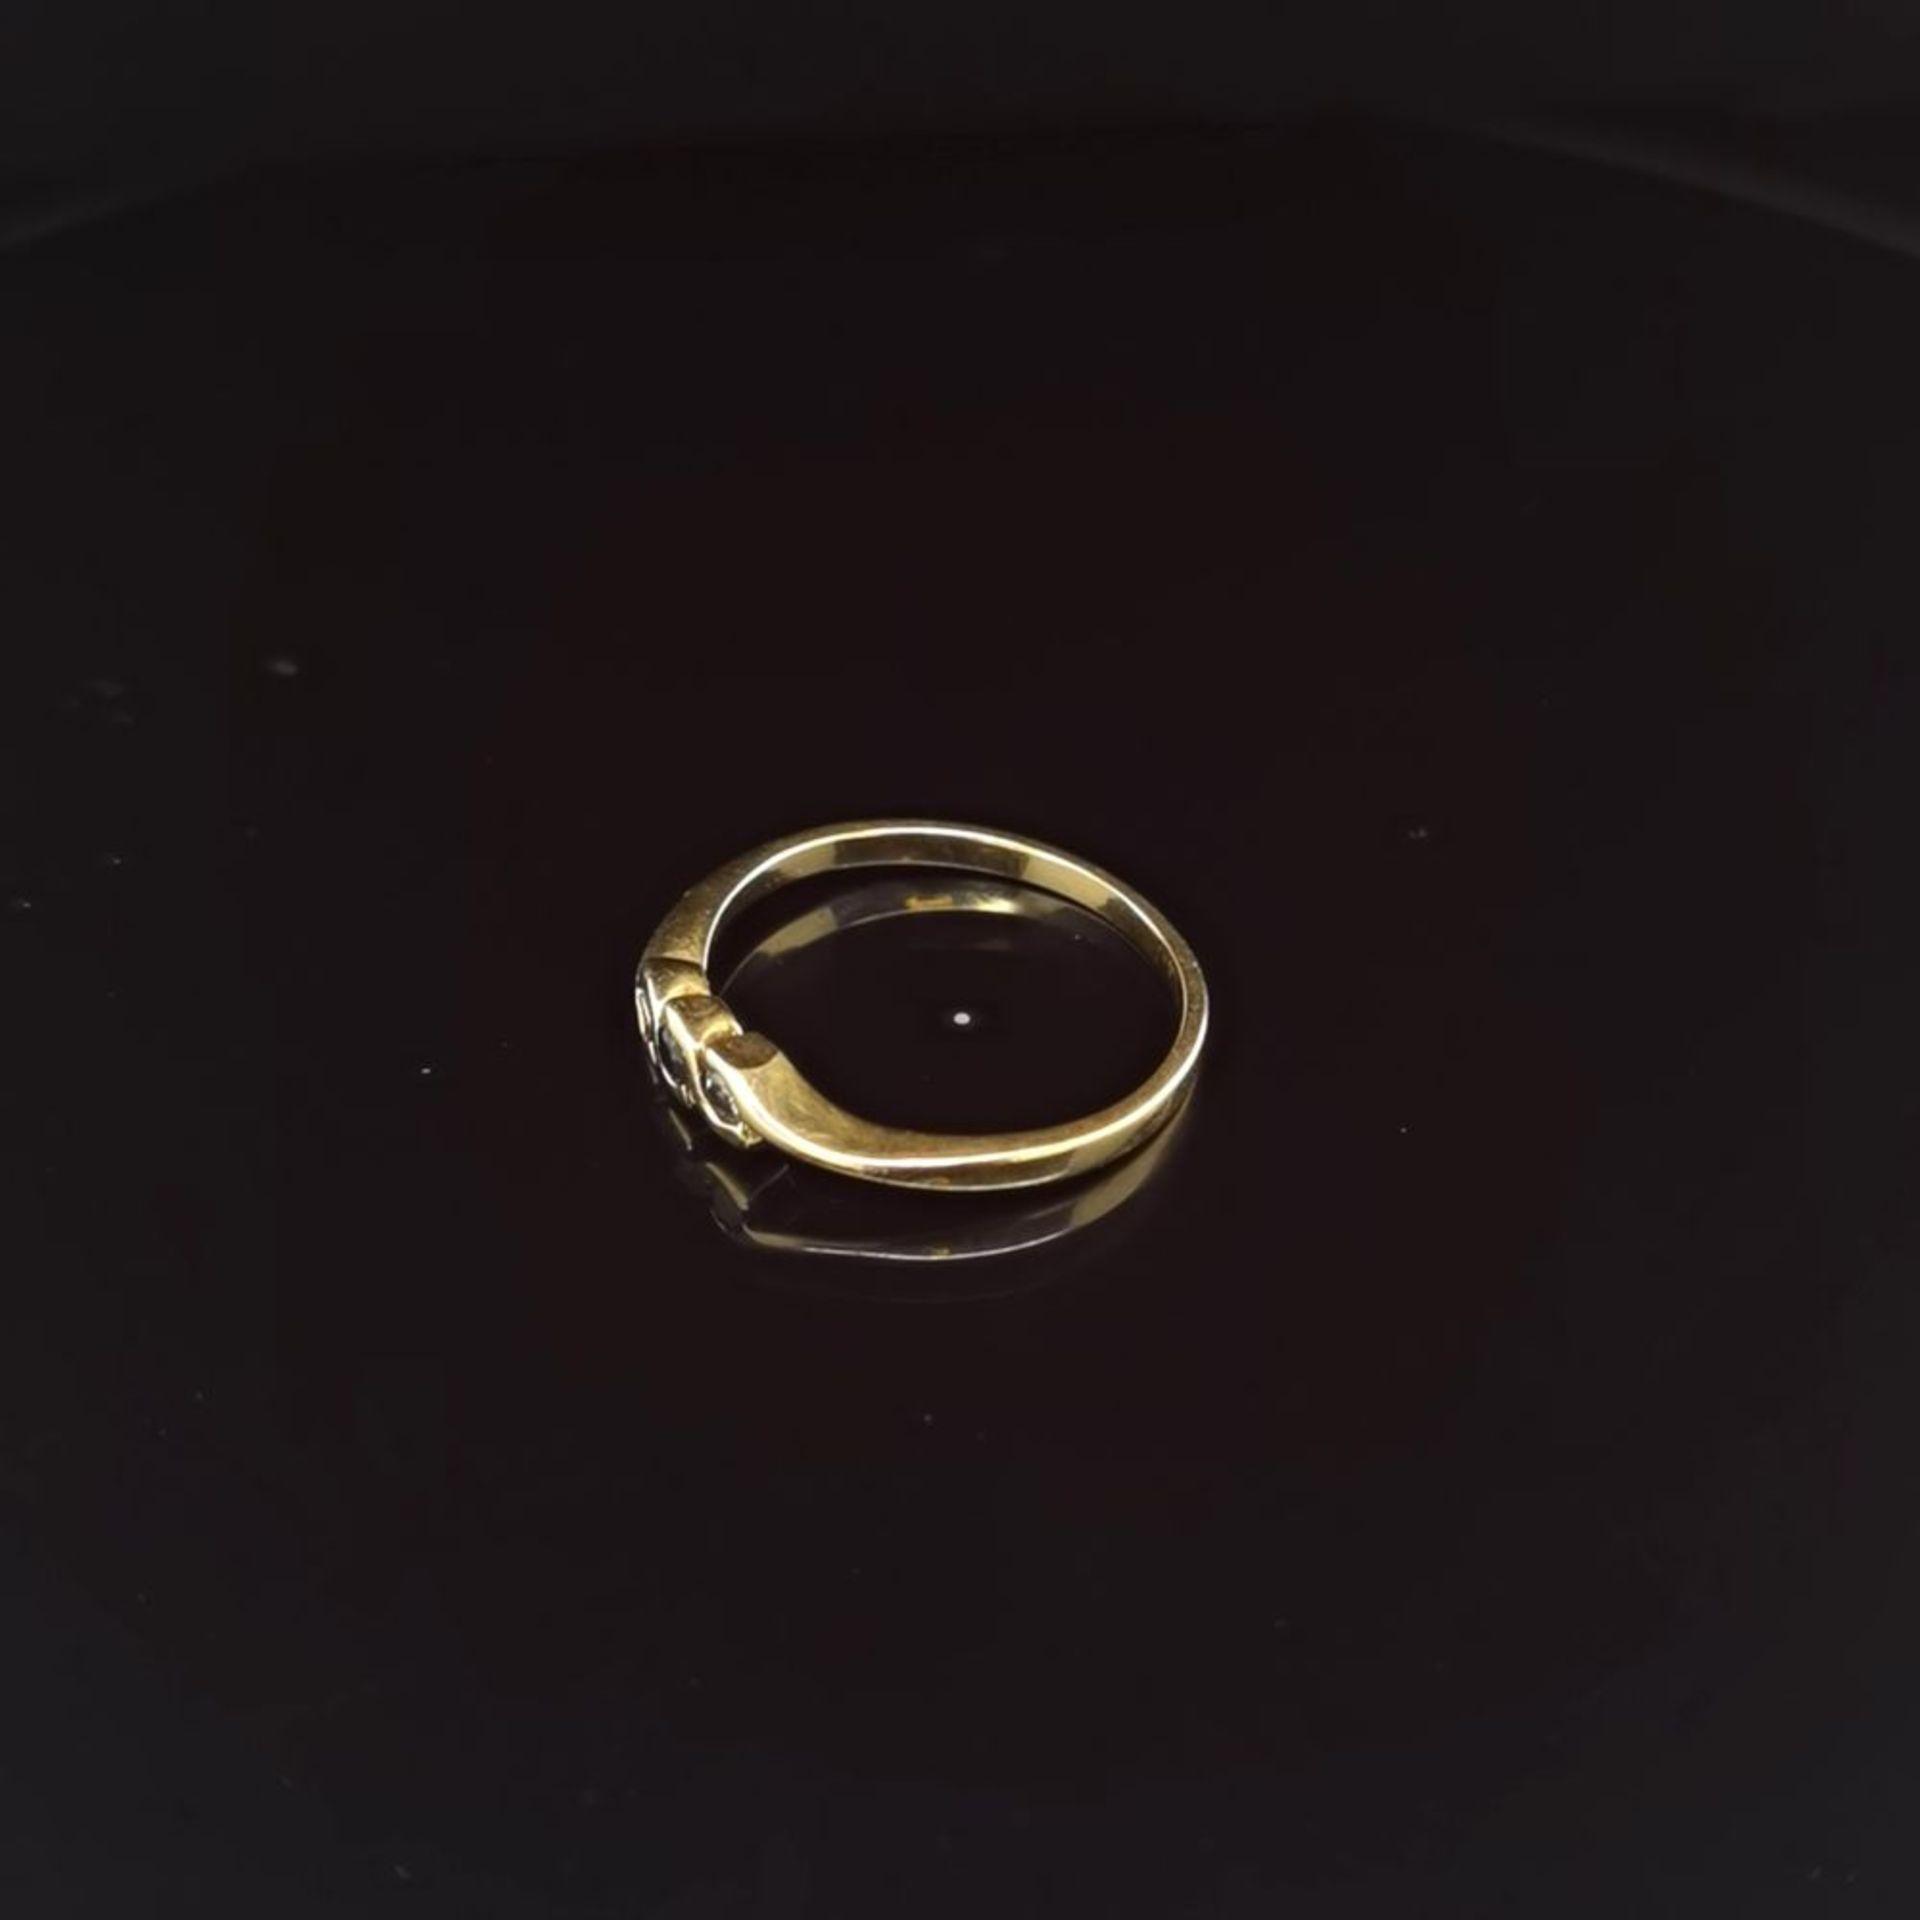 Saphir-Brillant-Ring, 750 Gelbgold 2,1 - Image 2 of 3